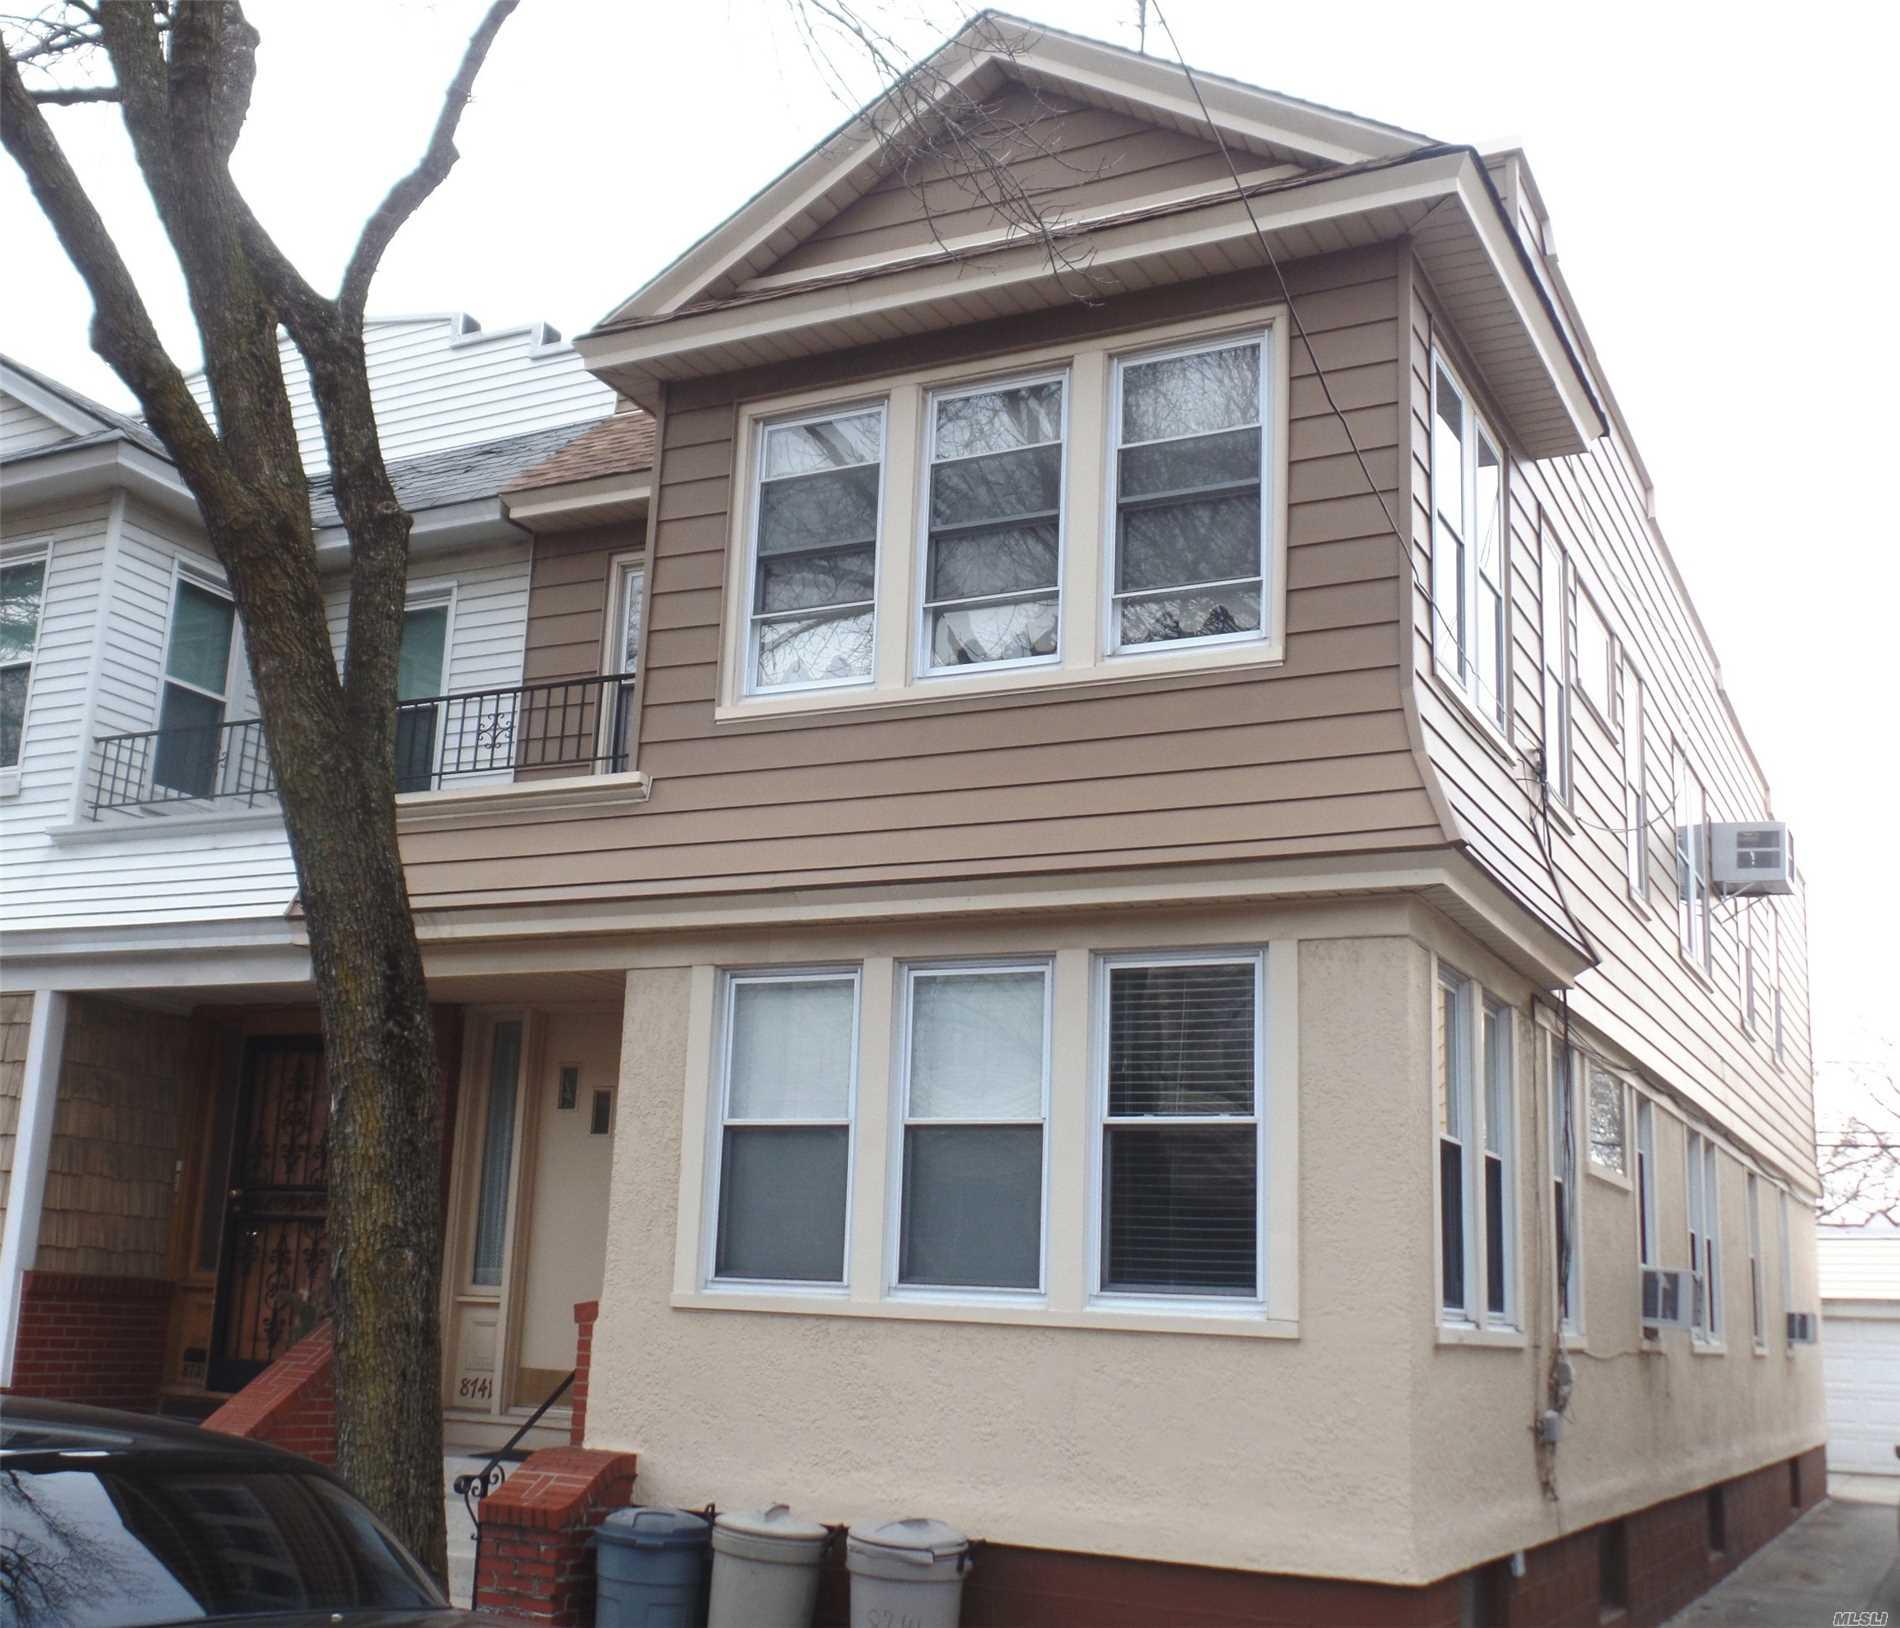 Property for sale at 87-41 81st Avenue, Glendale NY 11385, Glendale,  New York 11385